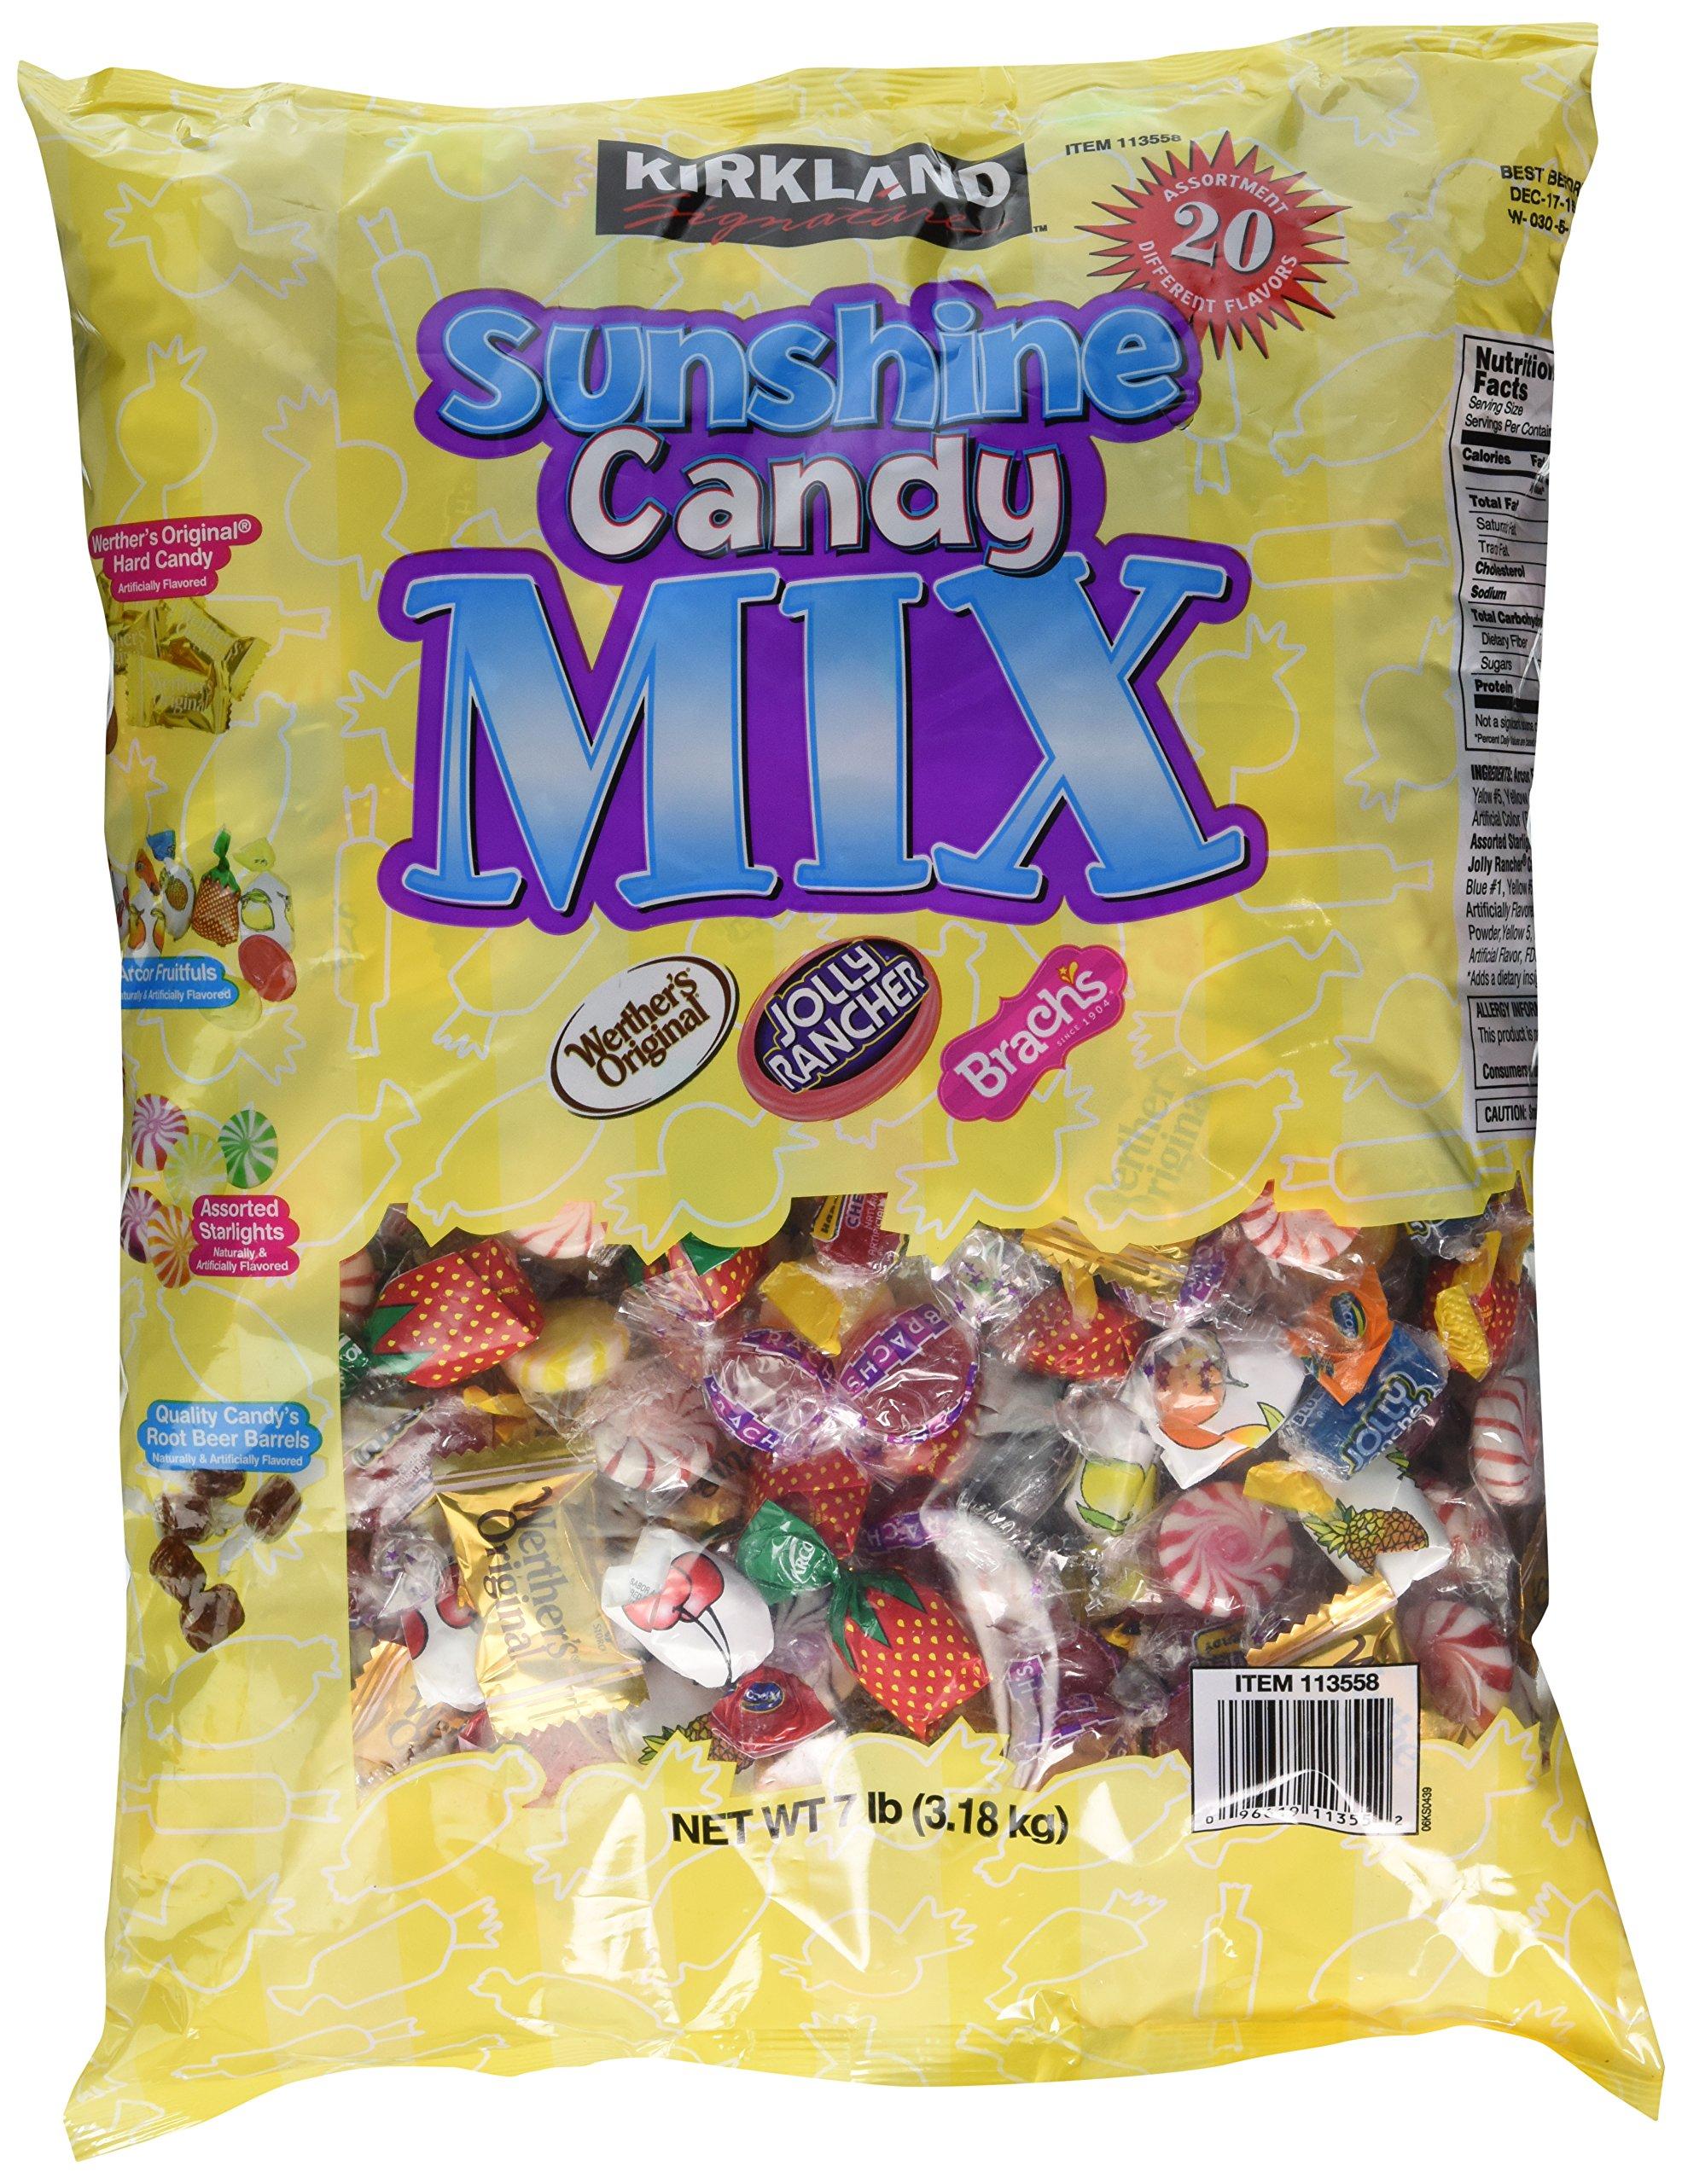 Candy S Colorado Cranker Blog Csm Tools For Cranking: Amazon.com : SweetGourmet Arcor Assorted Fruitfuls Candy